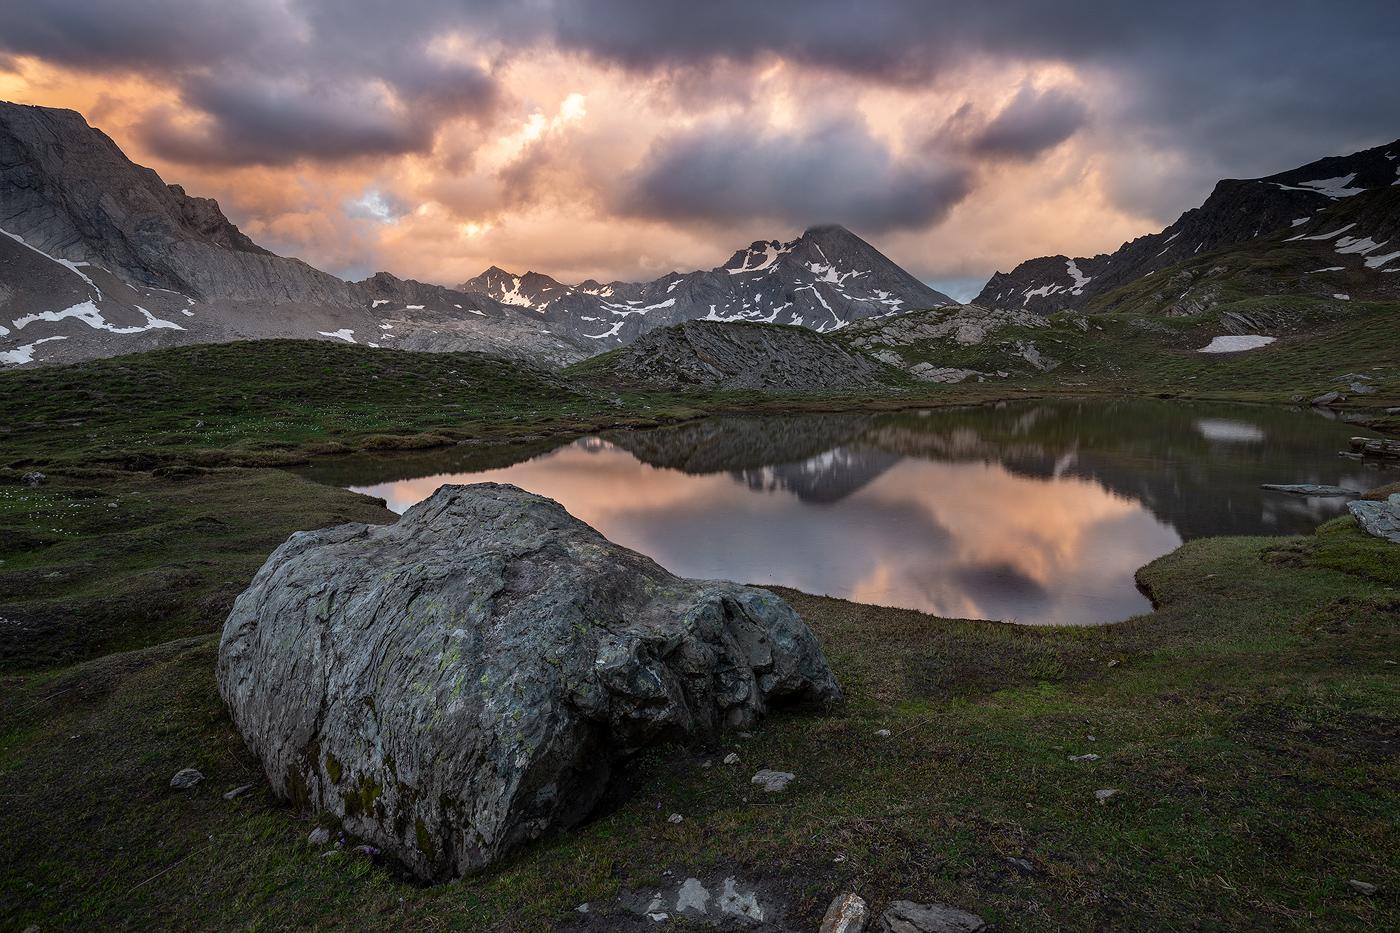 queyras-hautes-alpes-nicolas-rottiers-photographe-caen-normandie